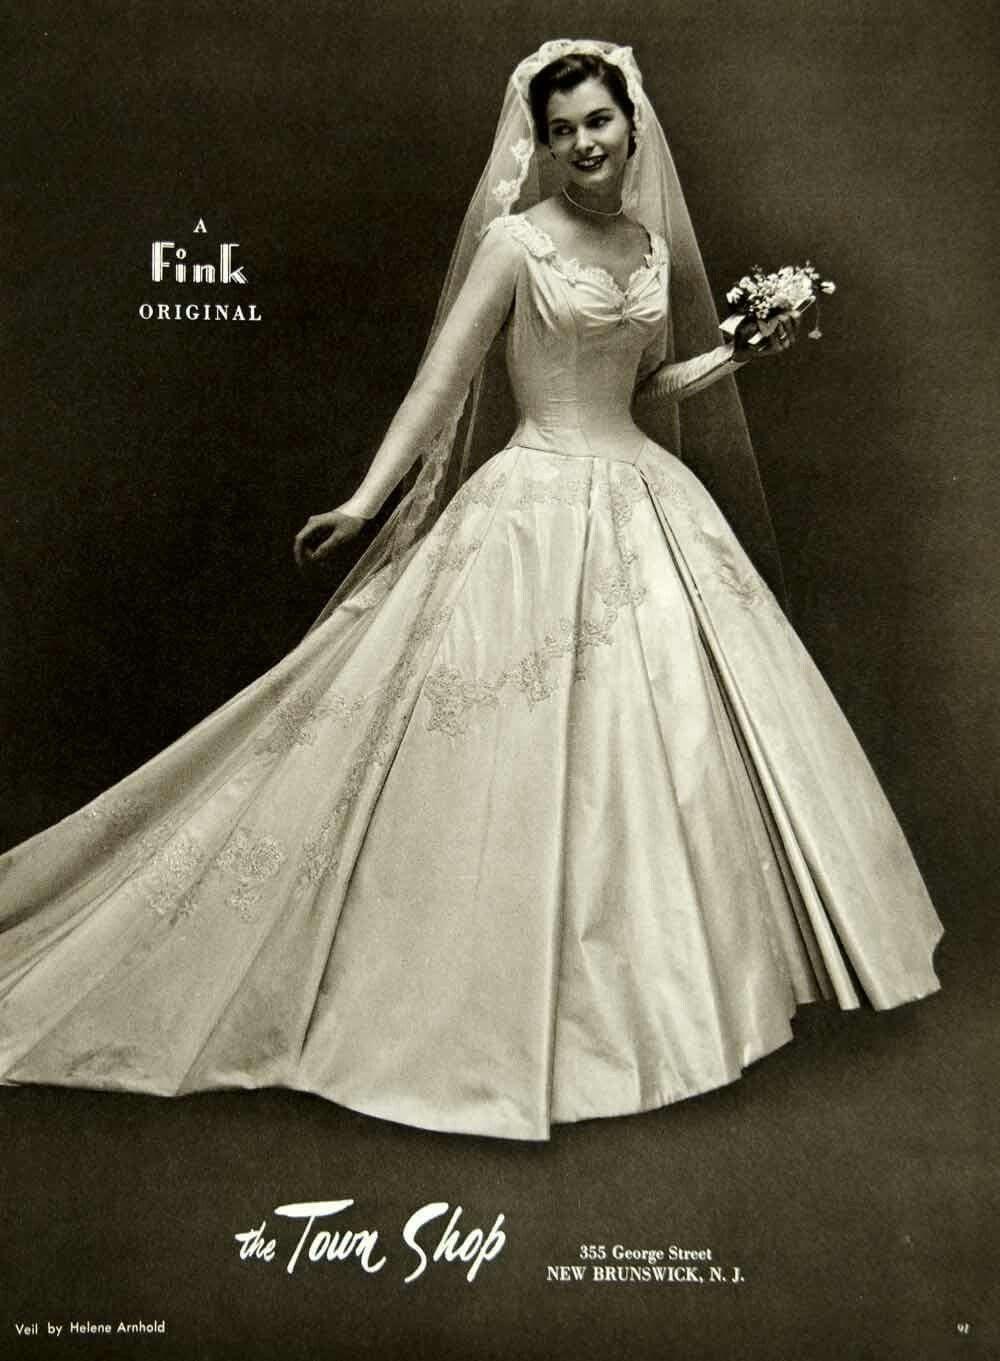 Pin by Alana Wilkie on Wedding Dresses   Pinterest   Wedding ...